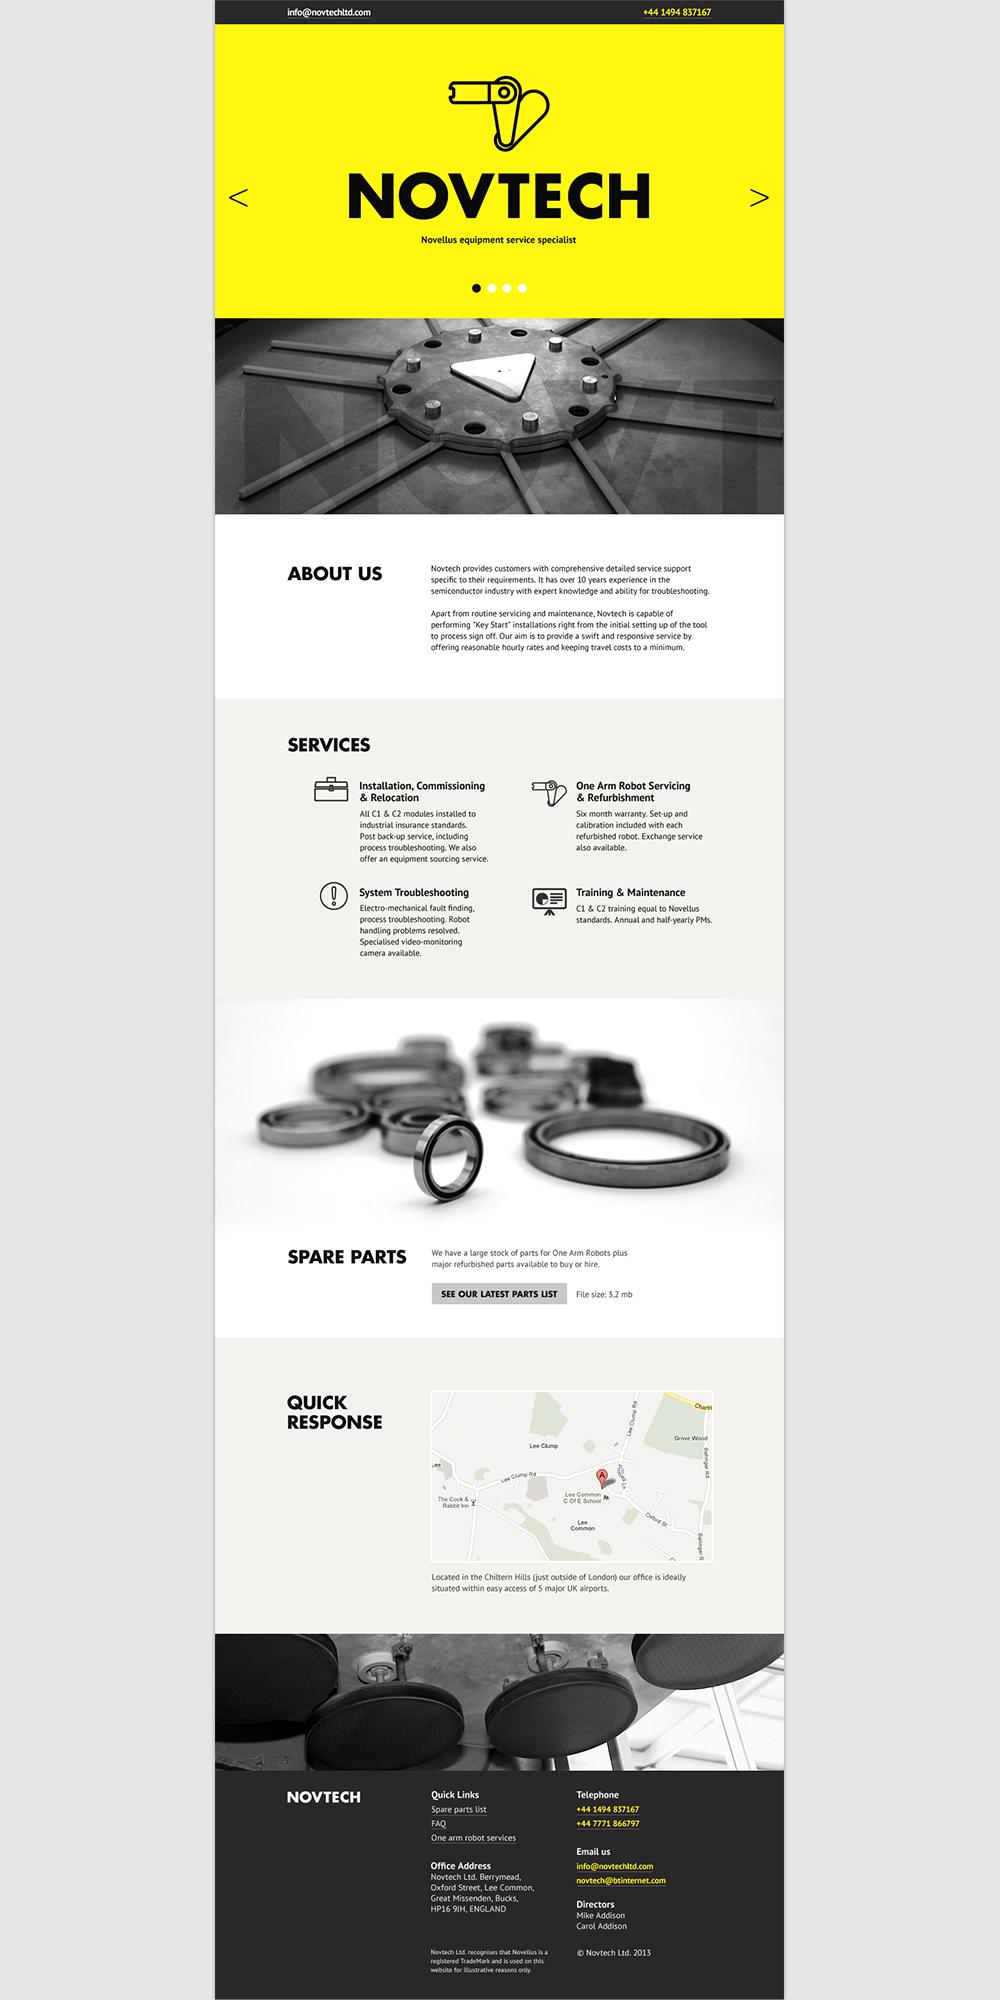 novtech_website